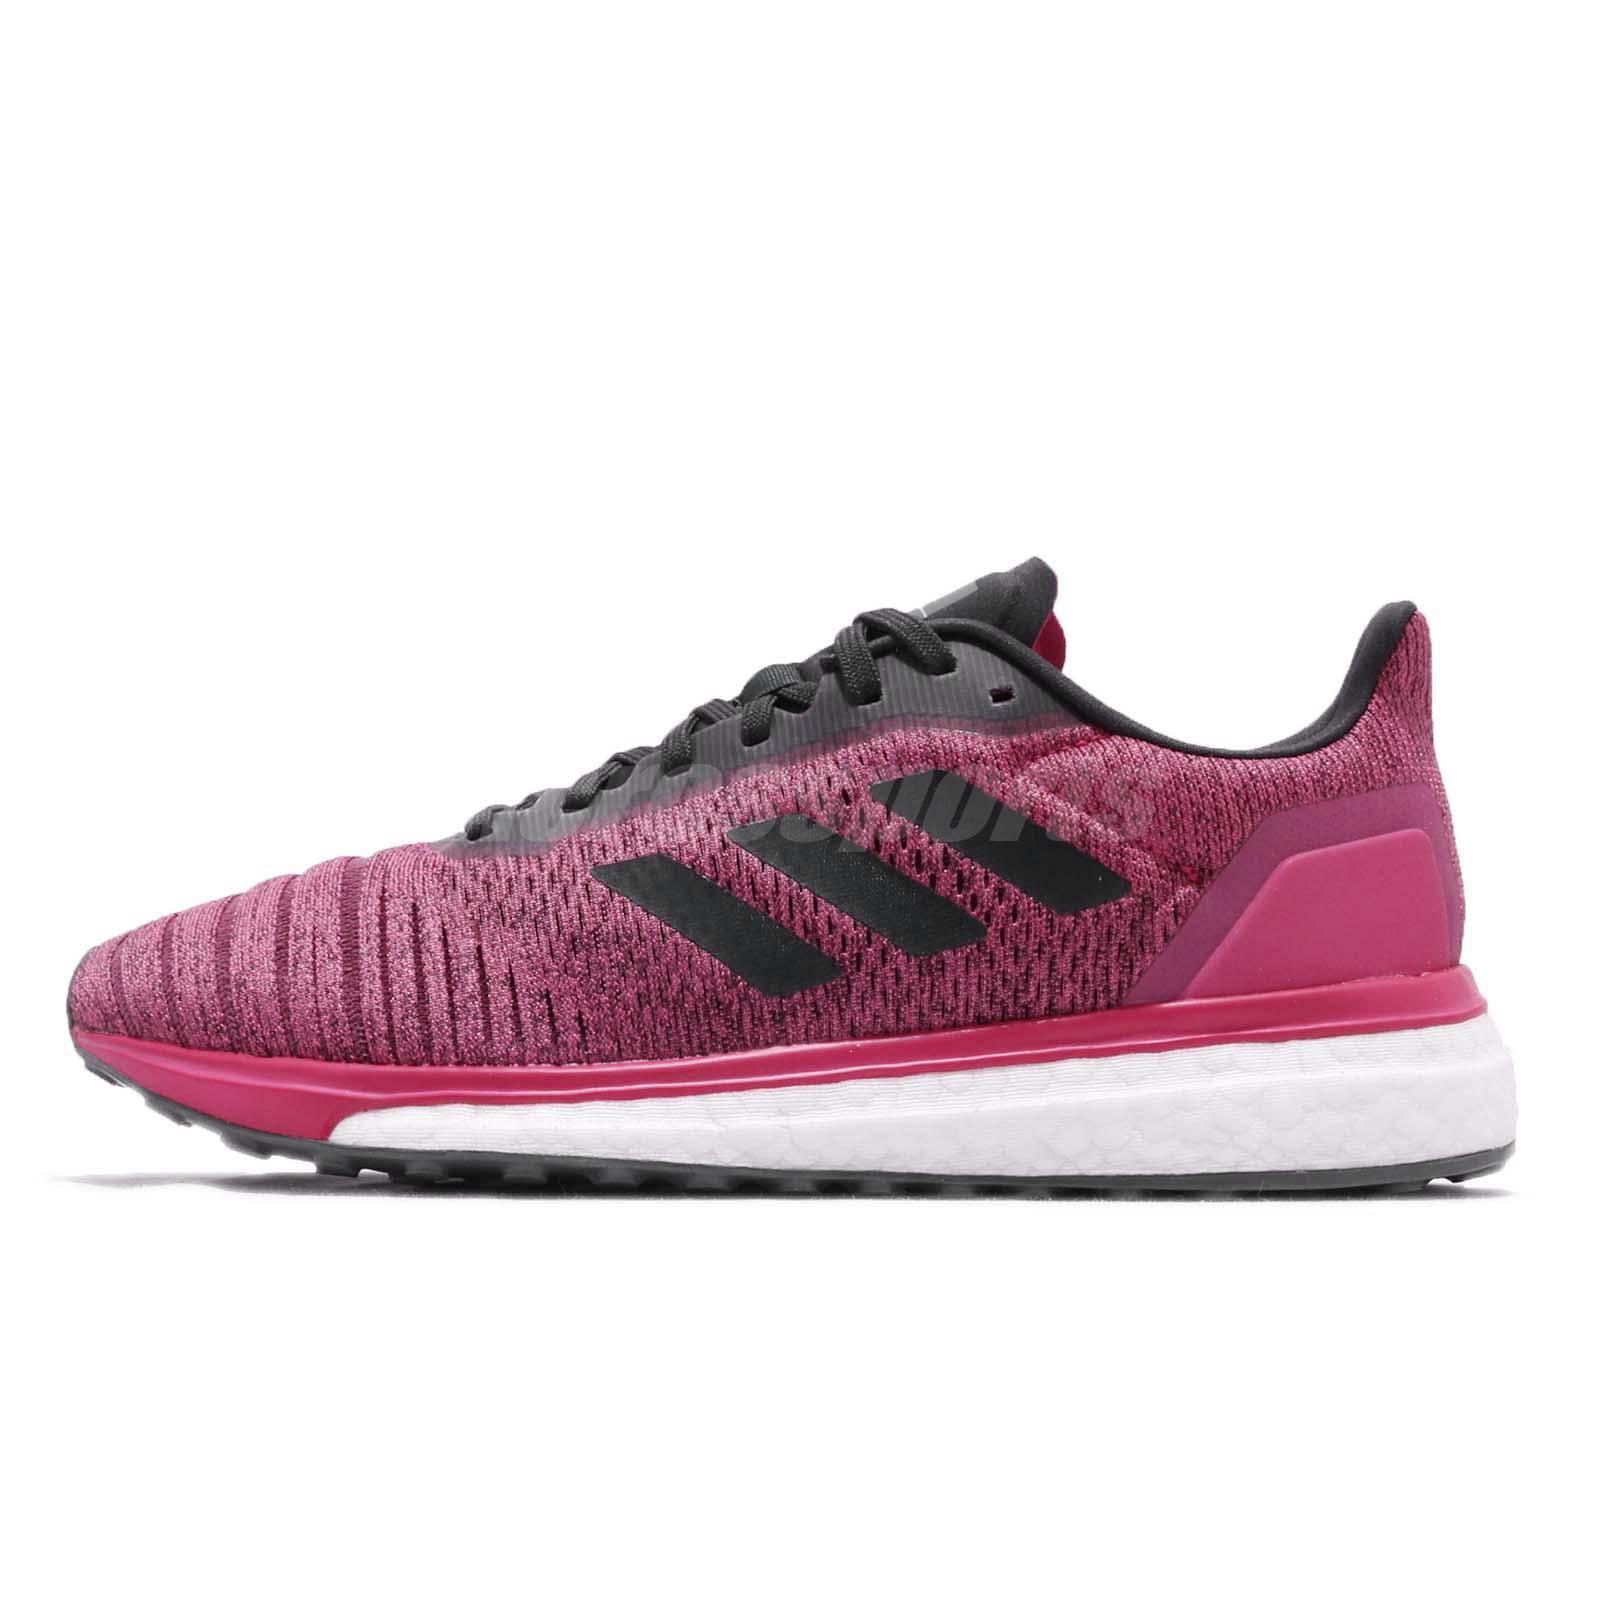 adidas Solar Drive W Boost Real Magenta Carbon Women Running Shoe Sneaker  AQ0339 b3ade6b17